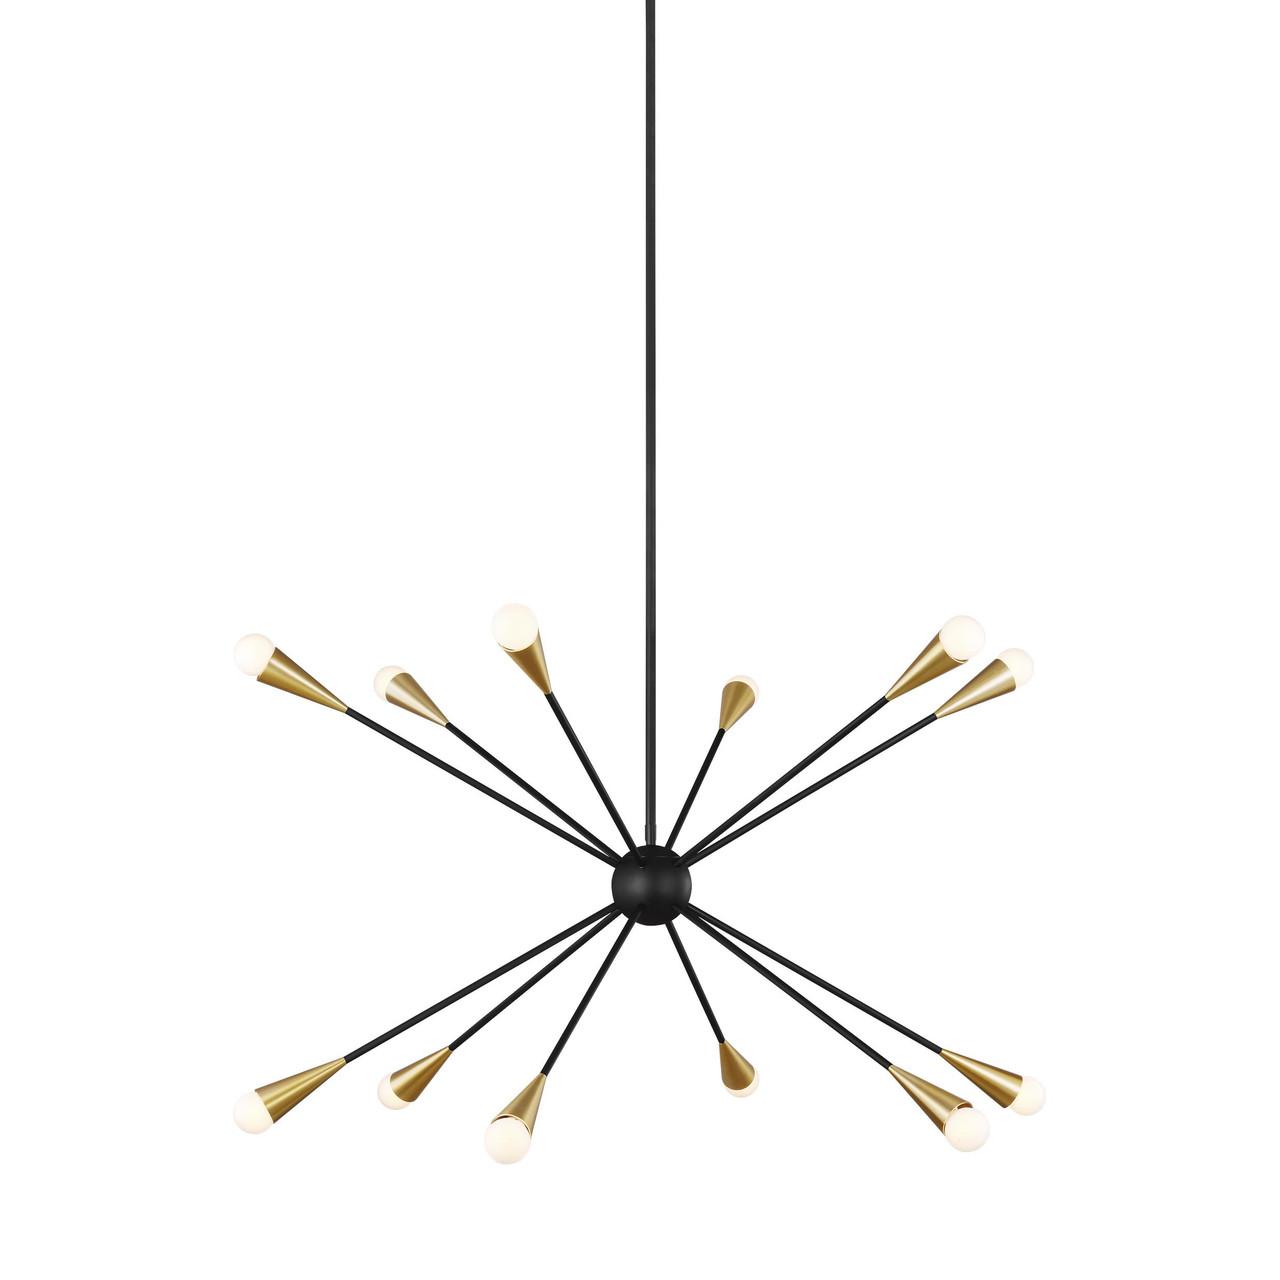 jax 12 light 38 chandelier by ed ellen degeneres